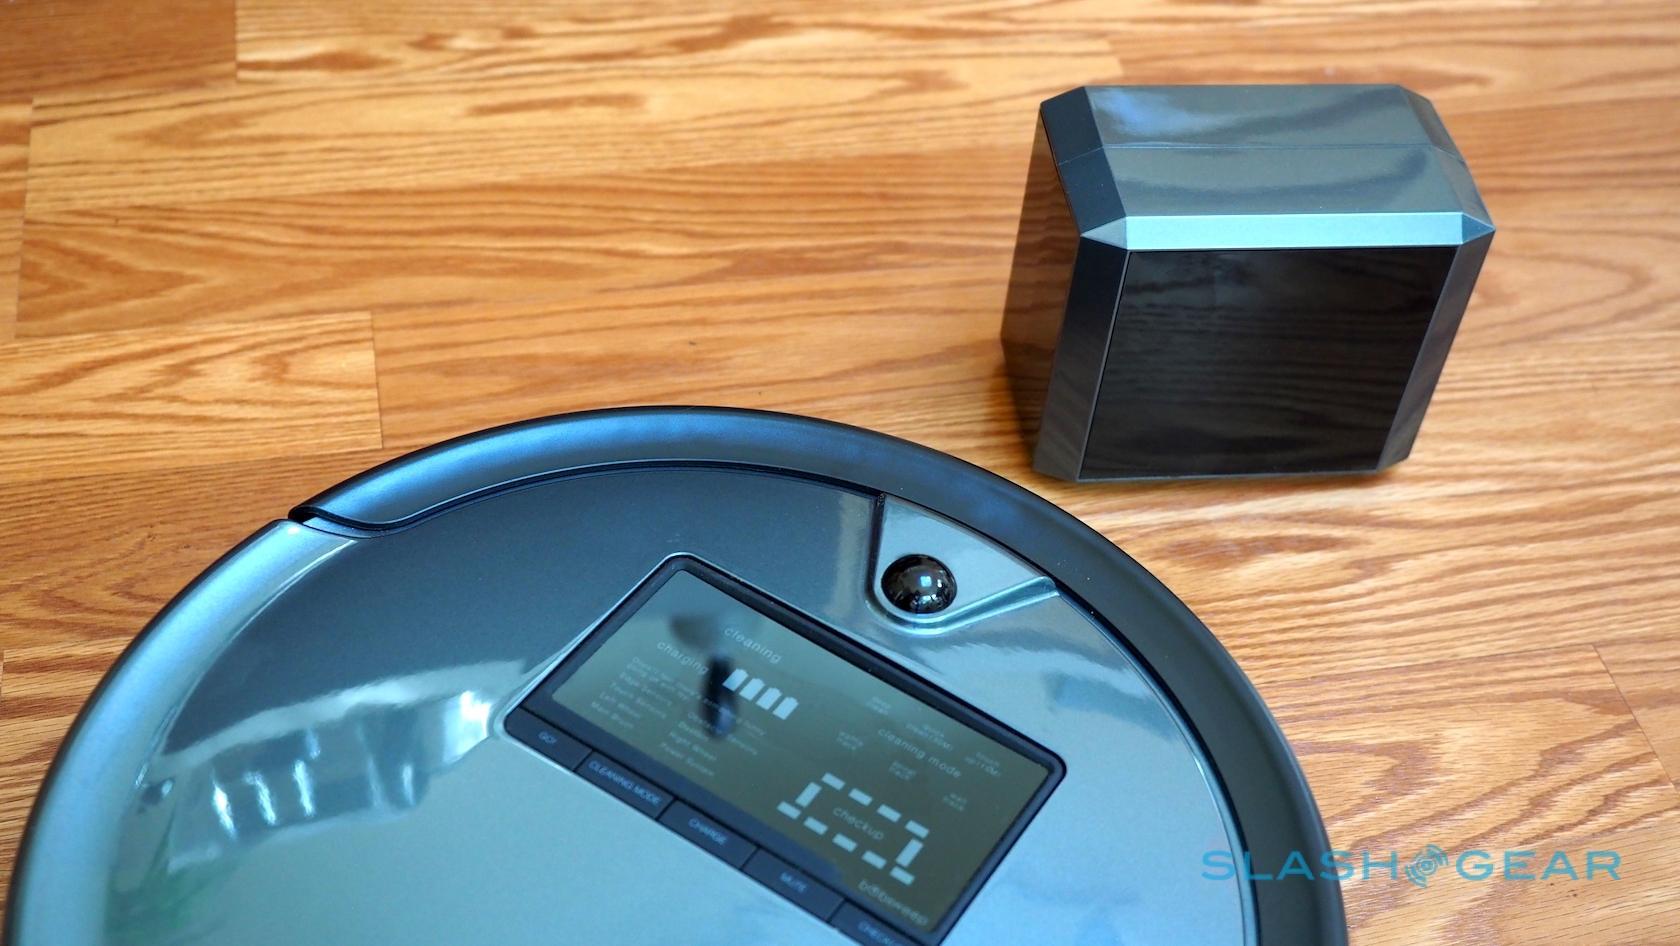 bObsweep PetHair Plus robot vacuum review - SlashGear